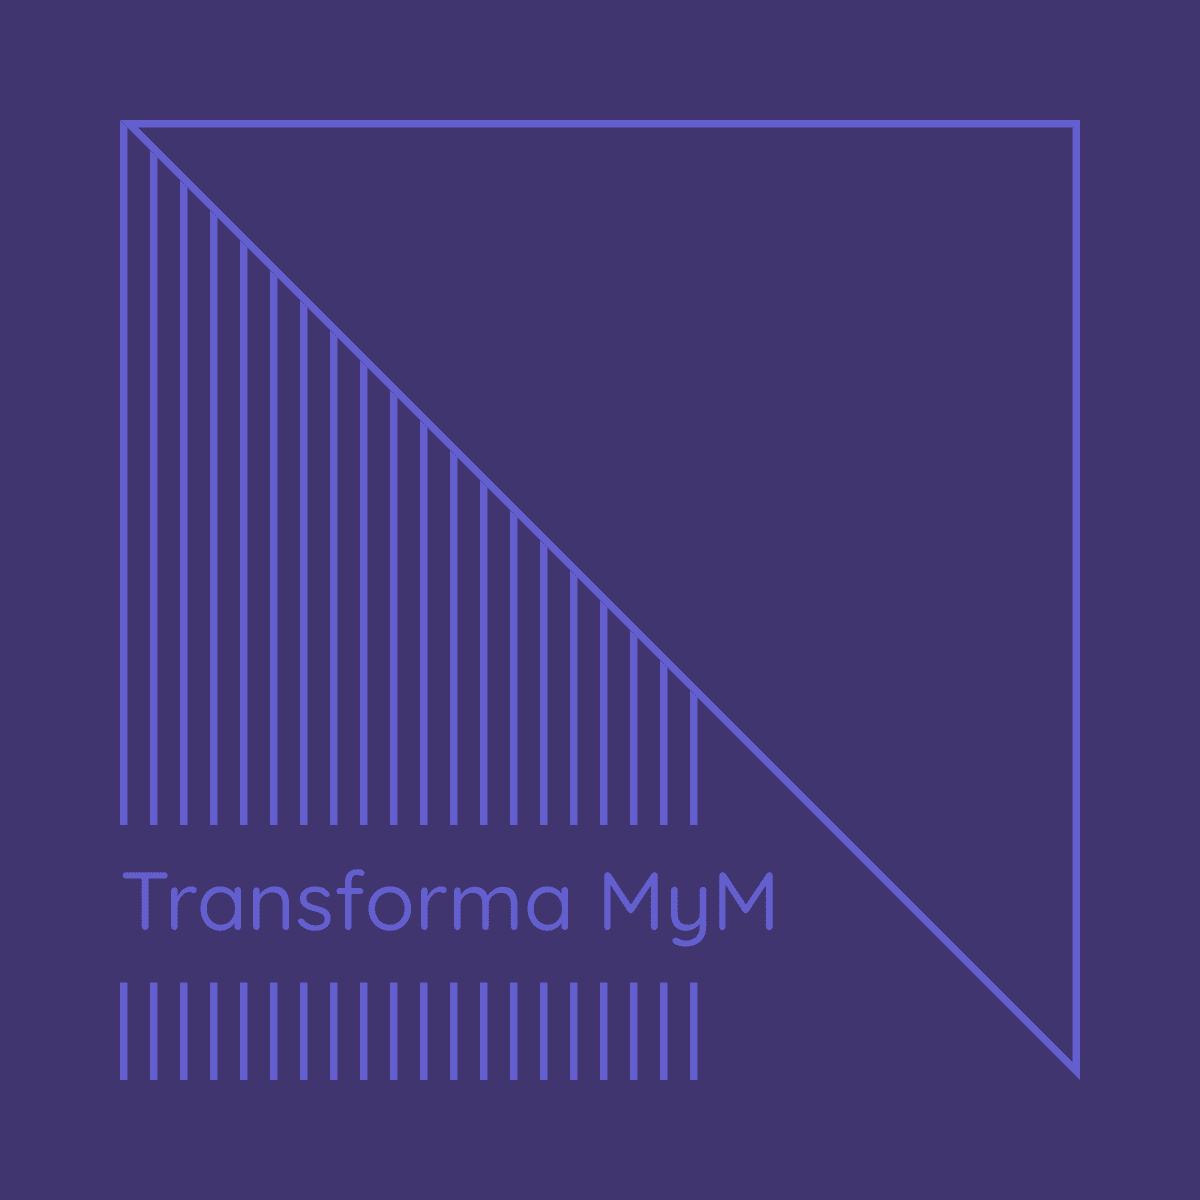 Transforma MyM